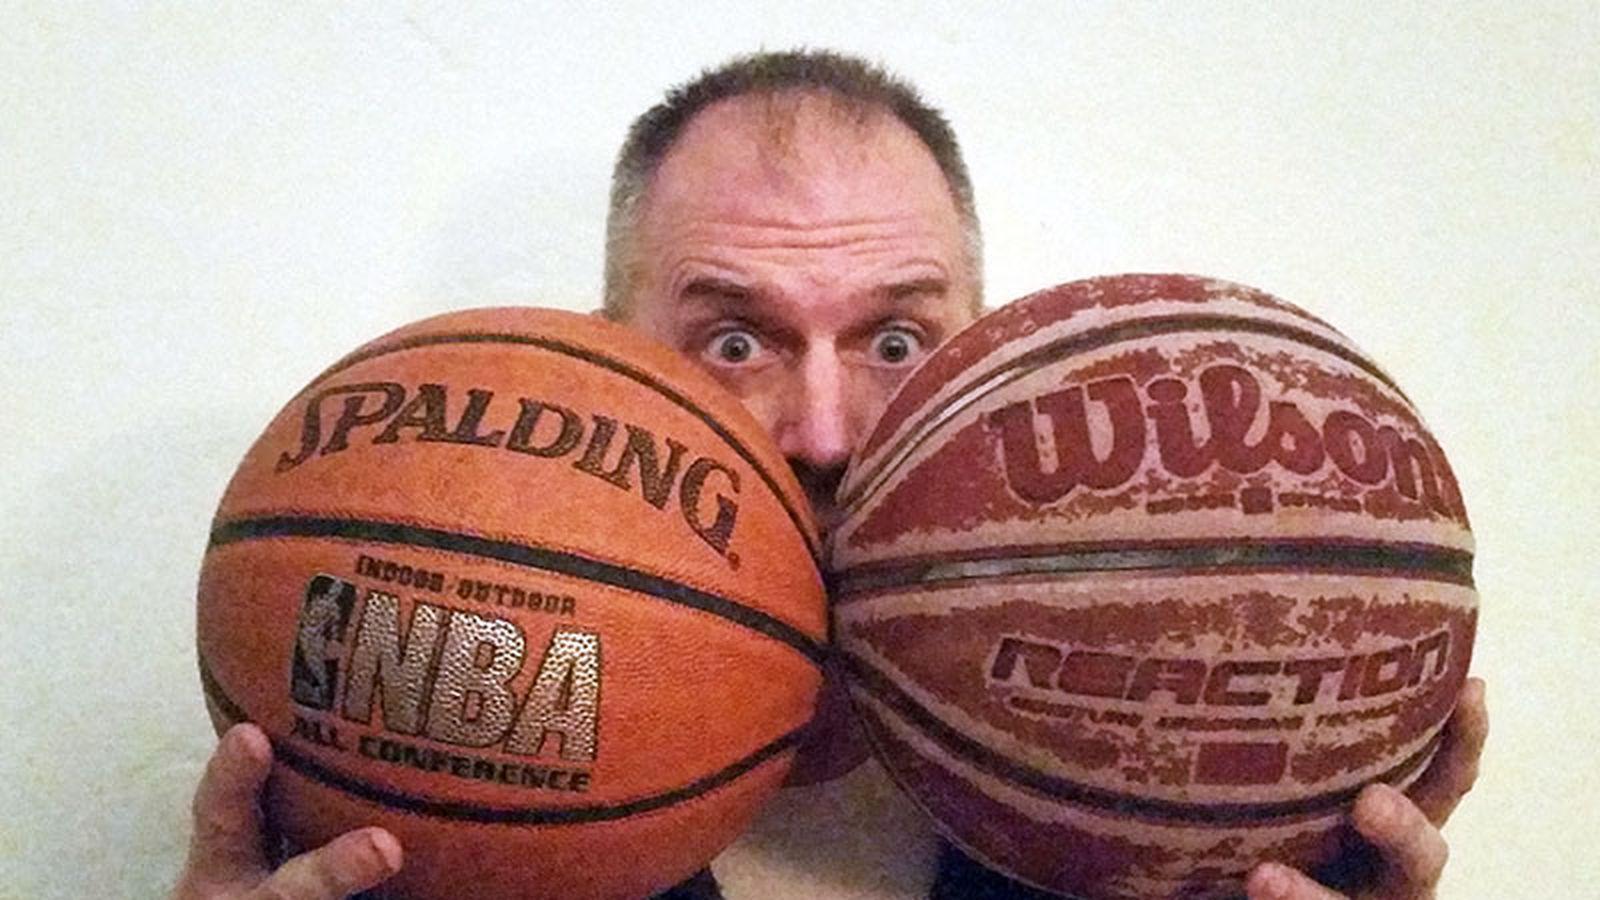 Balls.0.0